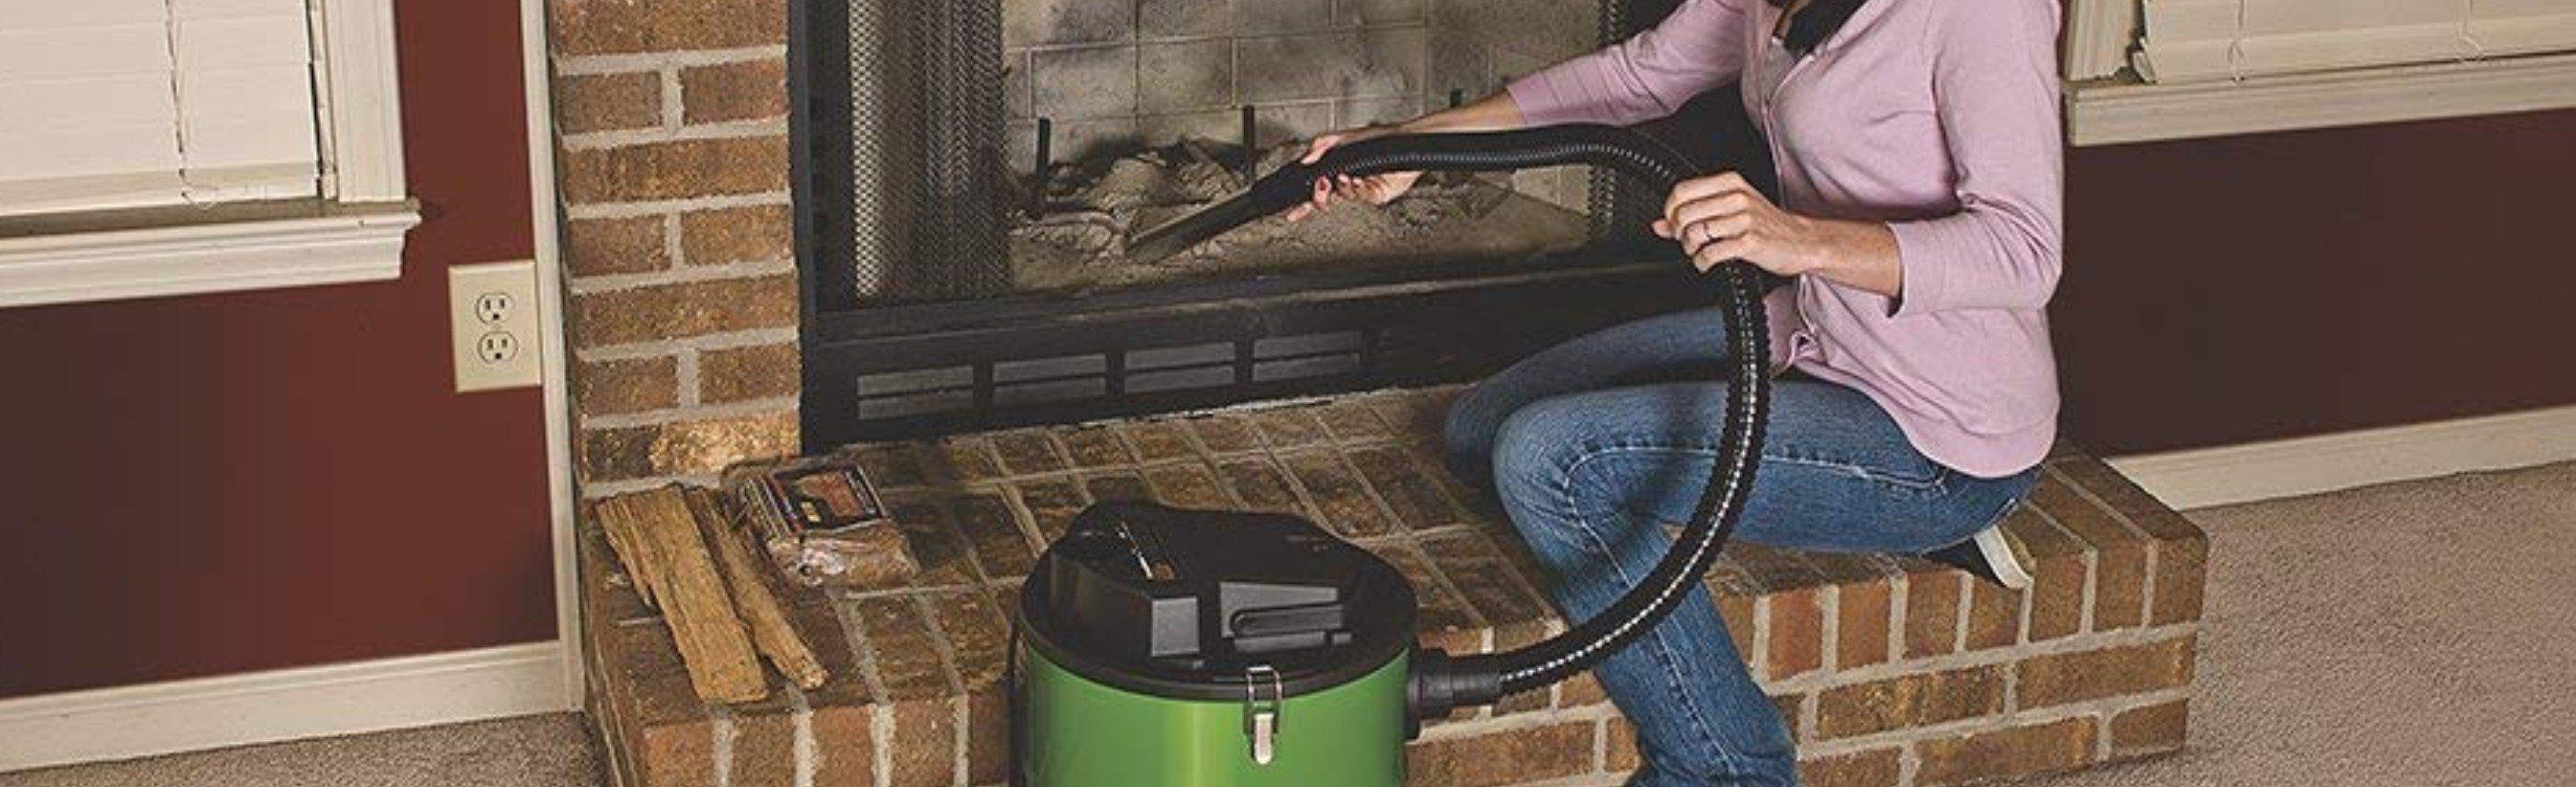 Top Ash Vacuums